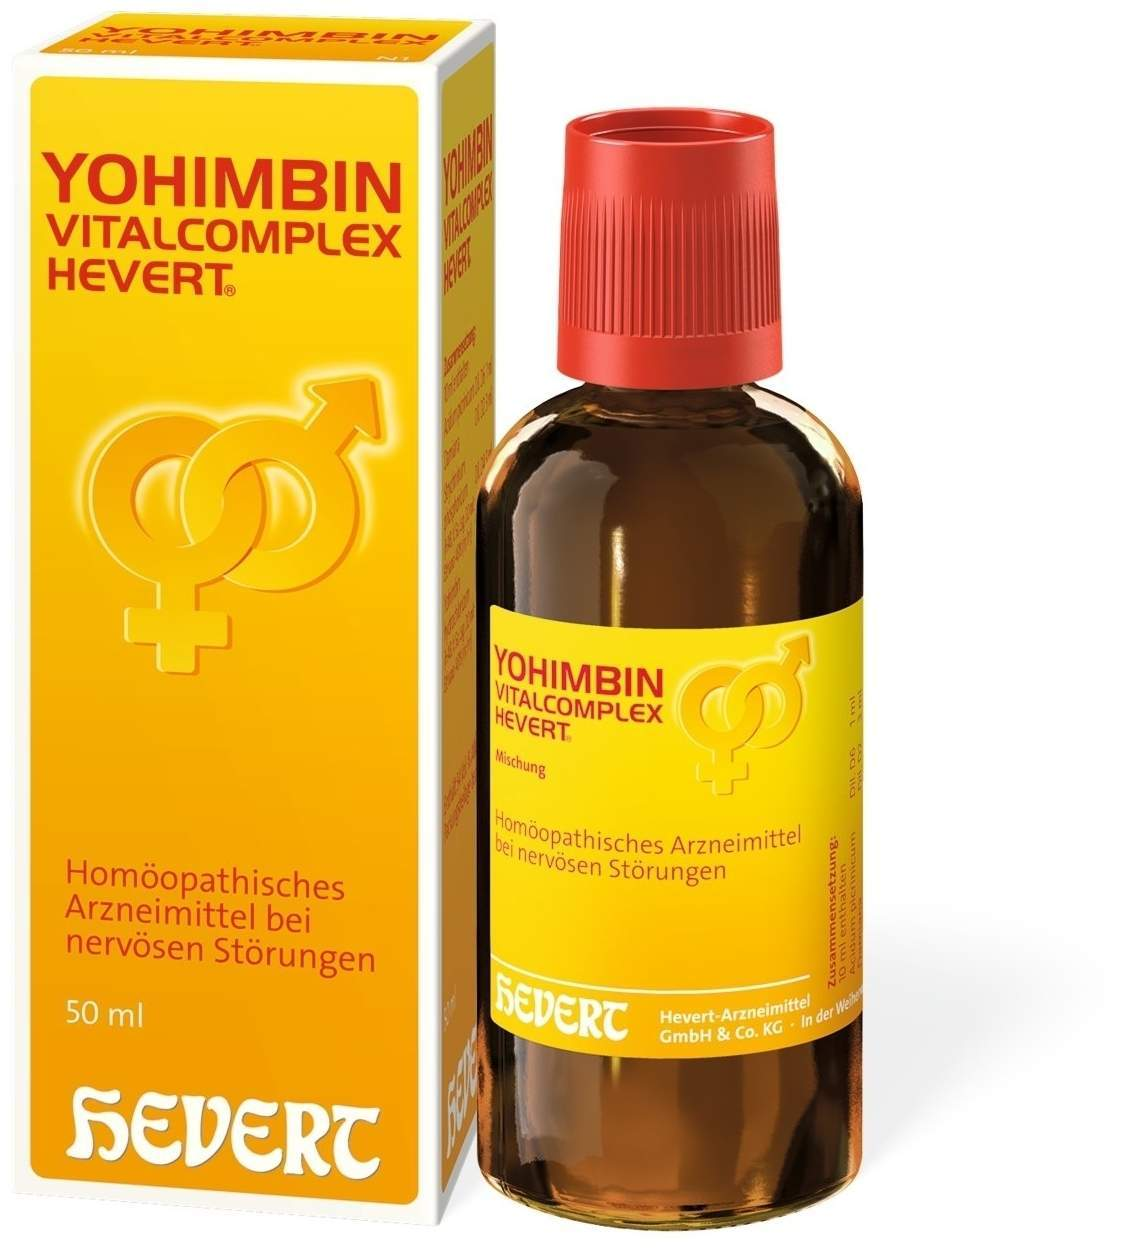 Yohimbin Vitalcomplex 50 ml Tropfen